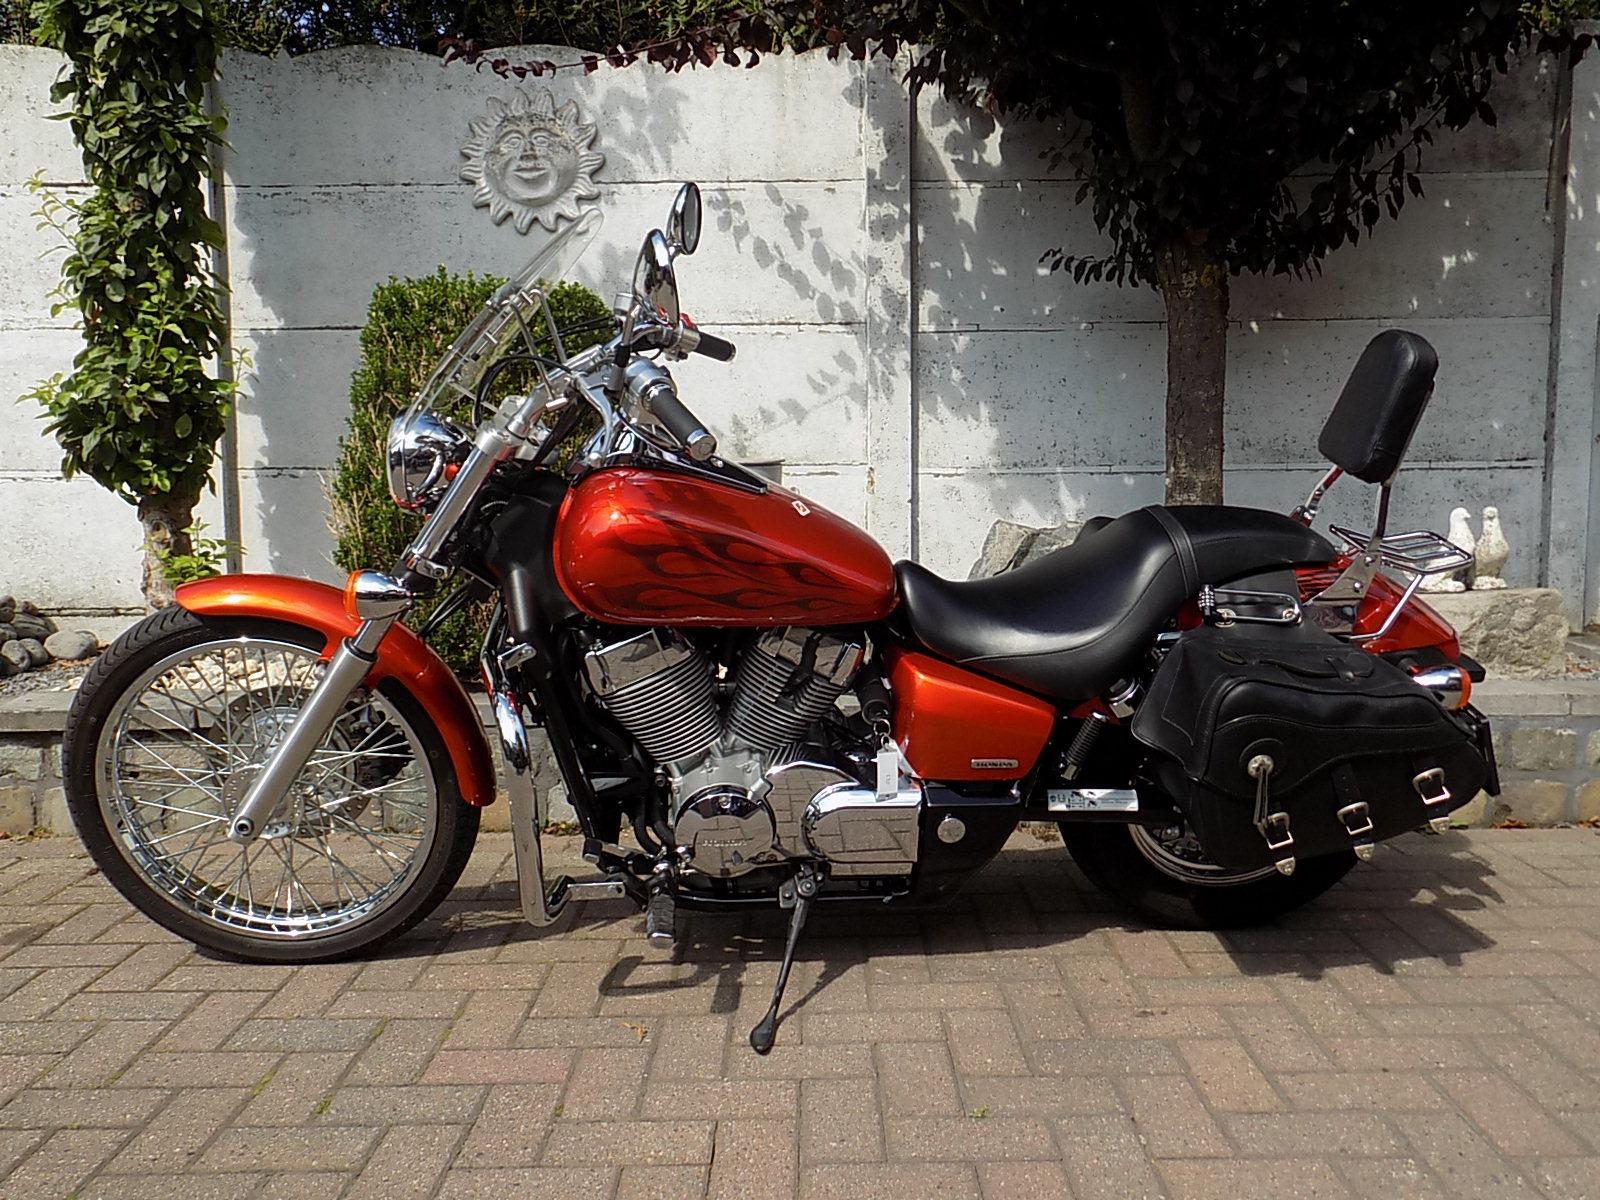 honda shadow spirit 750cc (A2 rijbewijs)!!! chopper